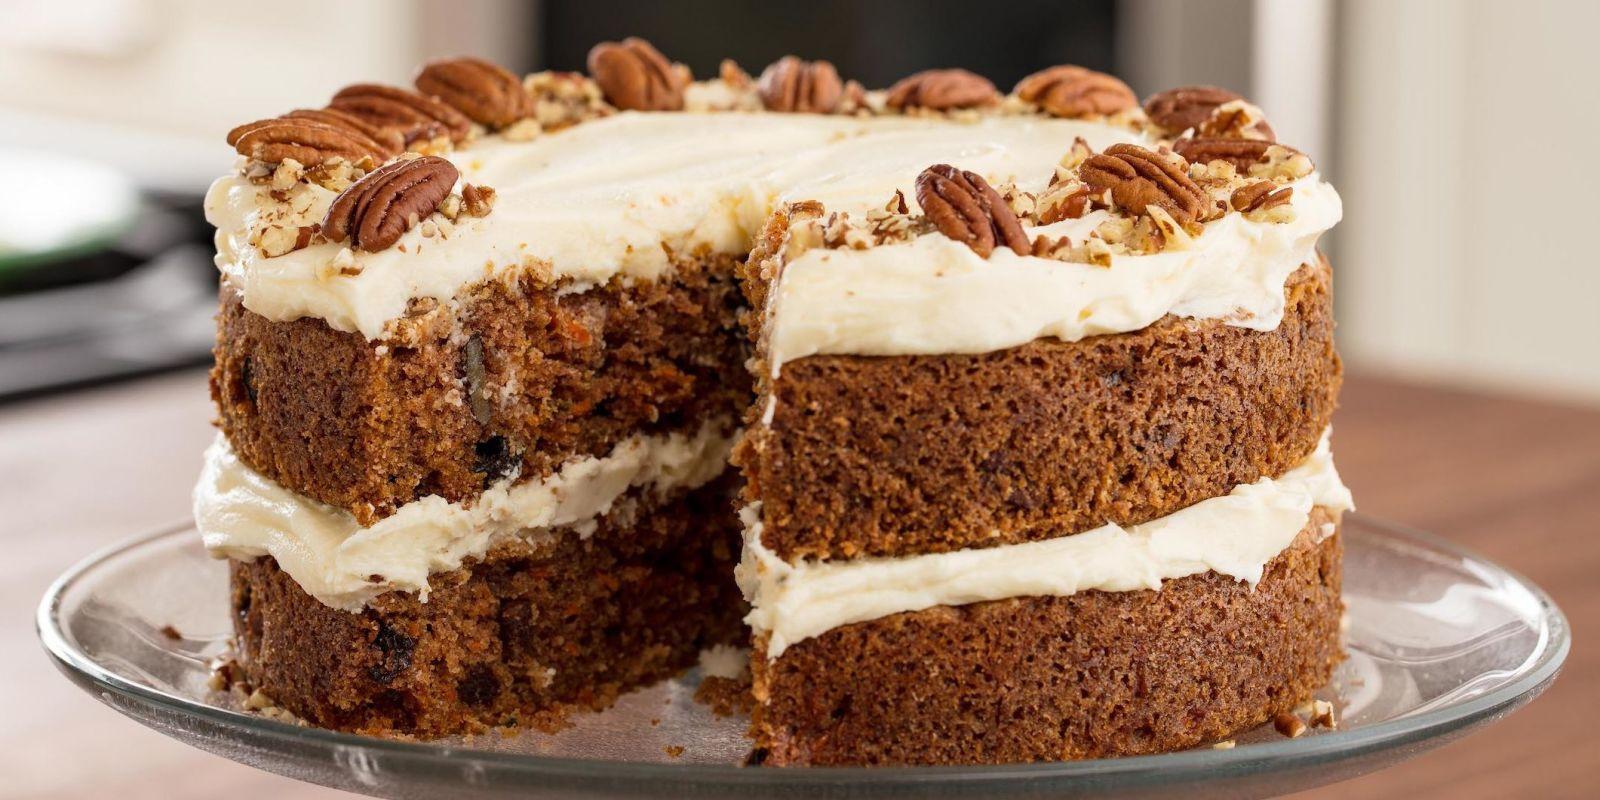 Cake Recipe Ideas  Best Carrot Cake Recipe How to Make Carrot Cake